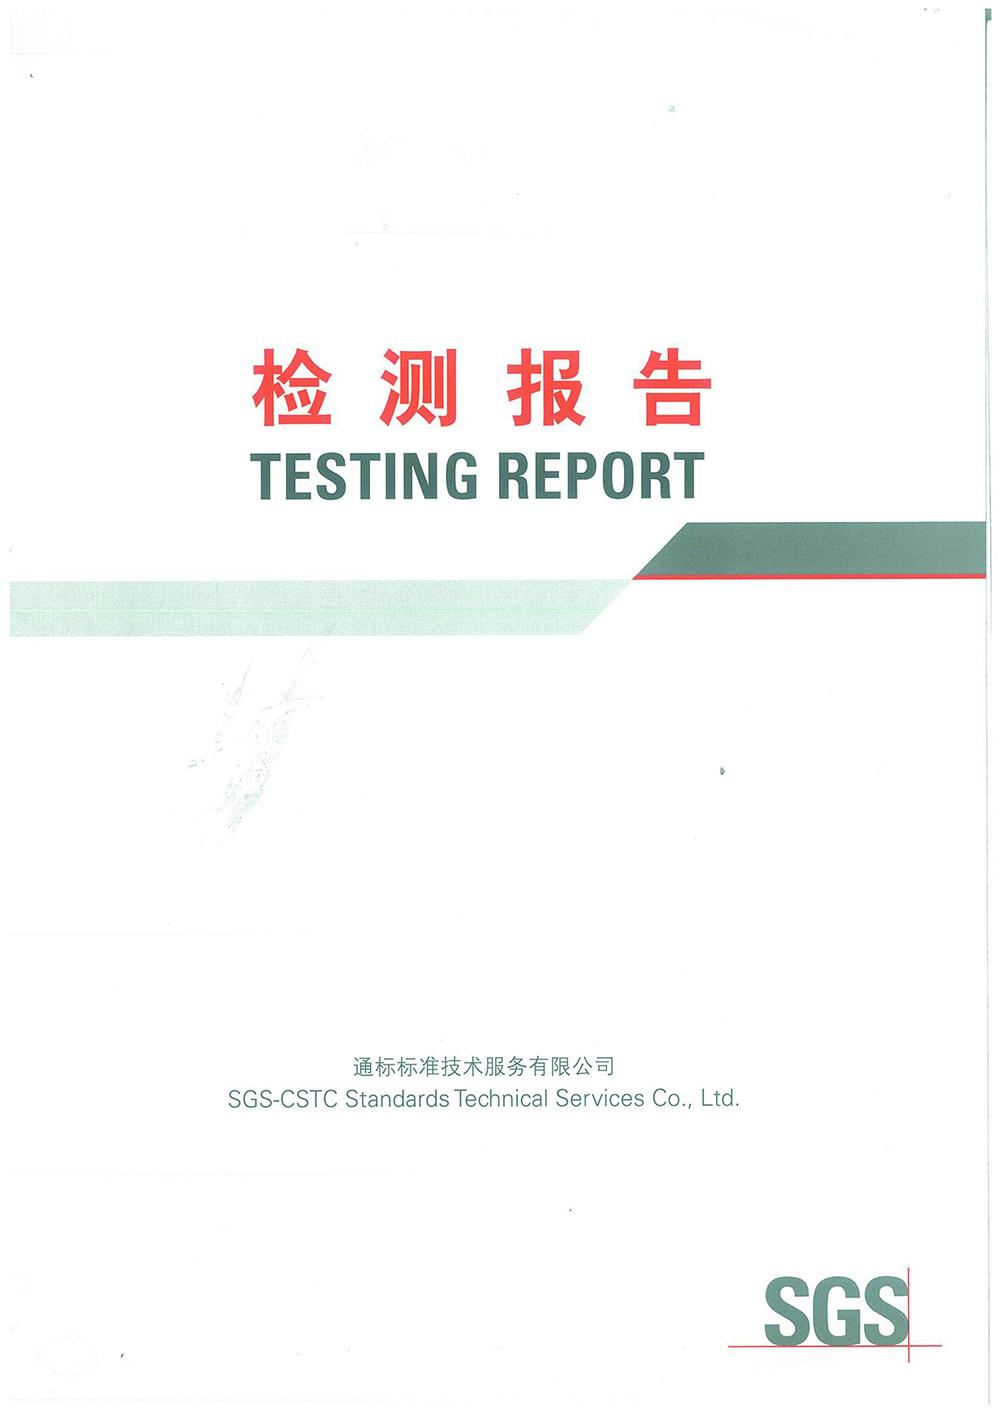 SGS证书-1-1.jpg